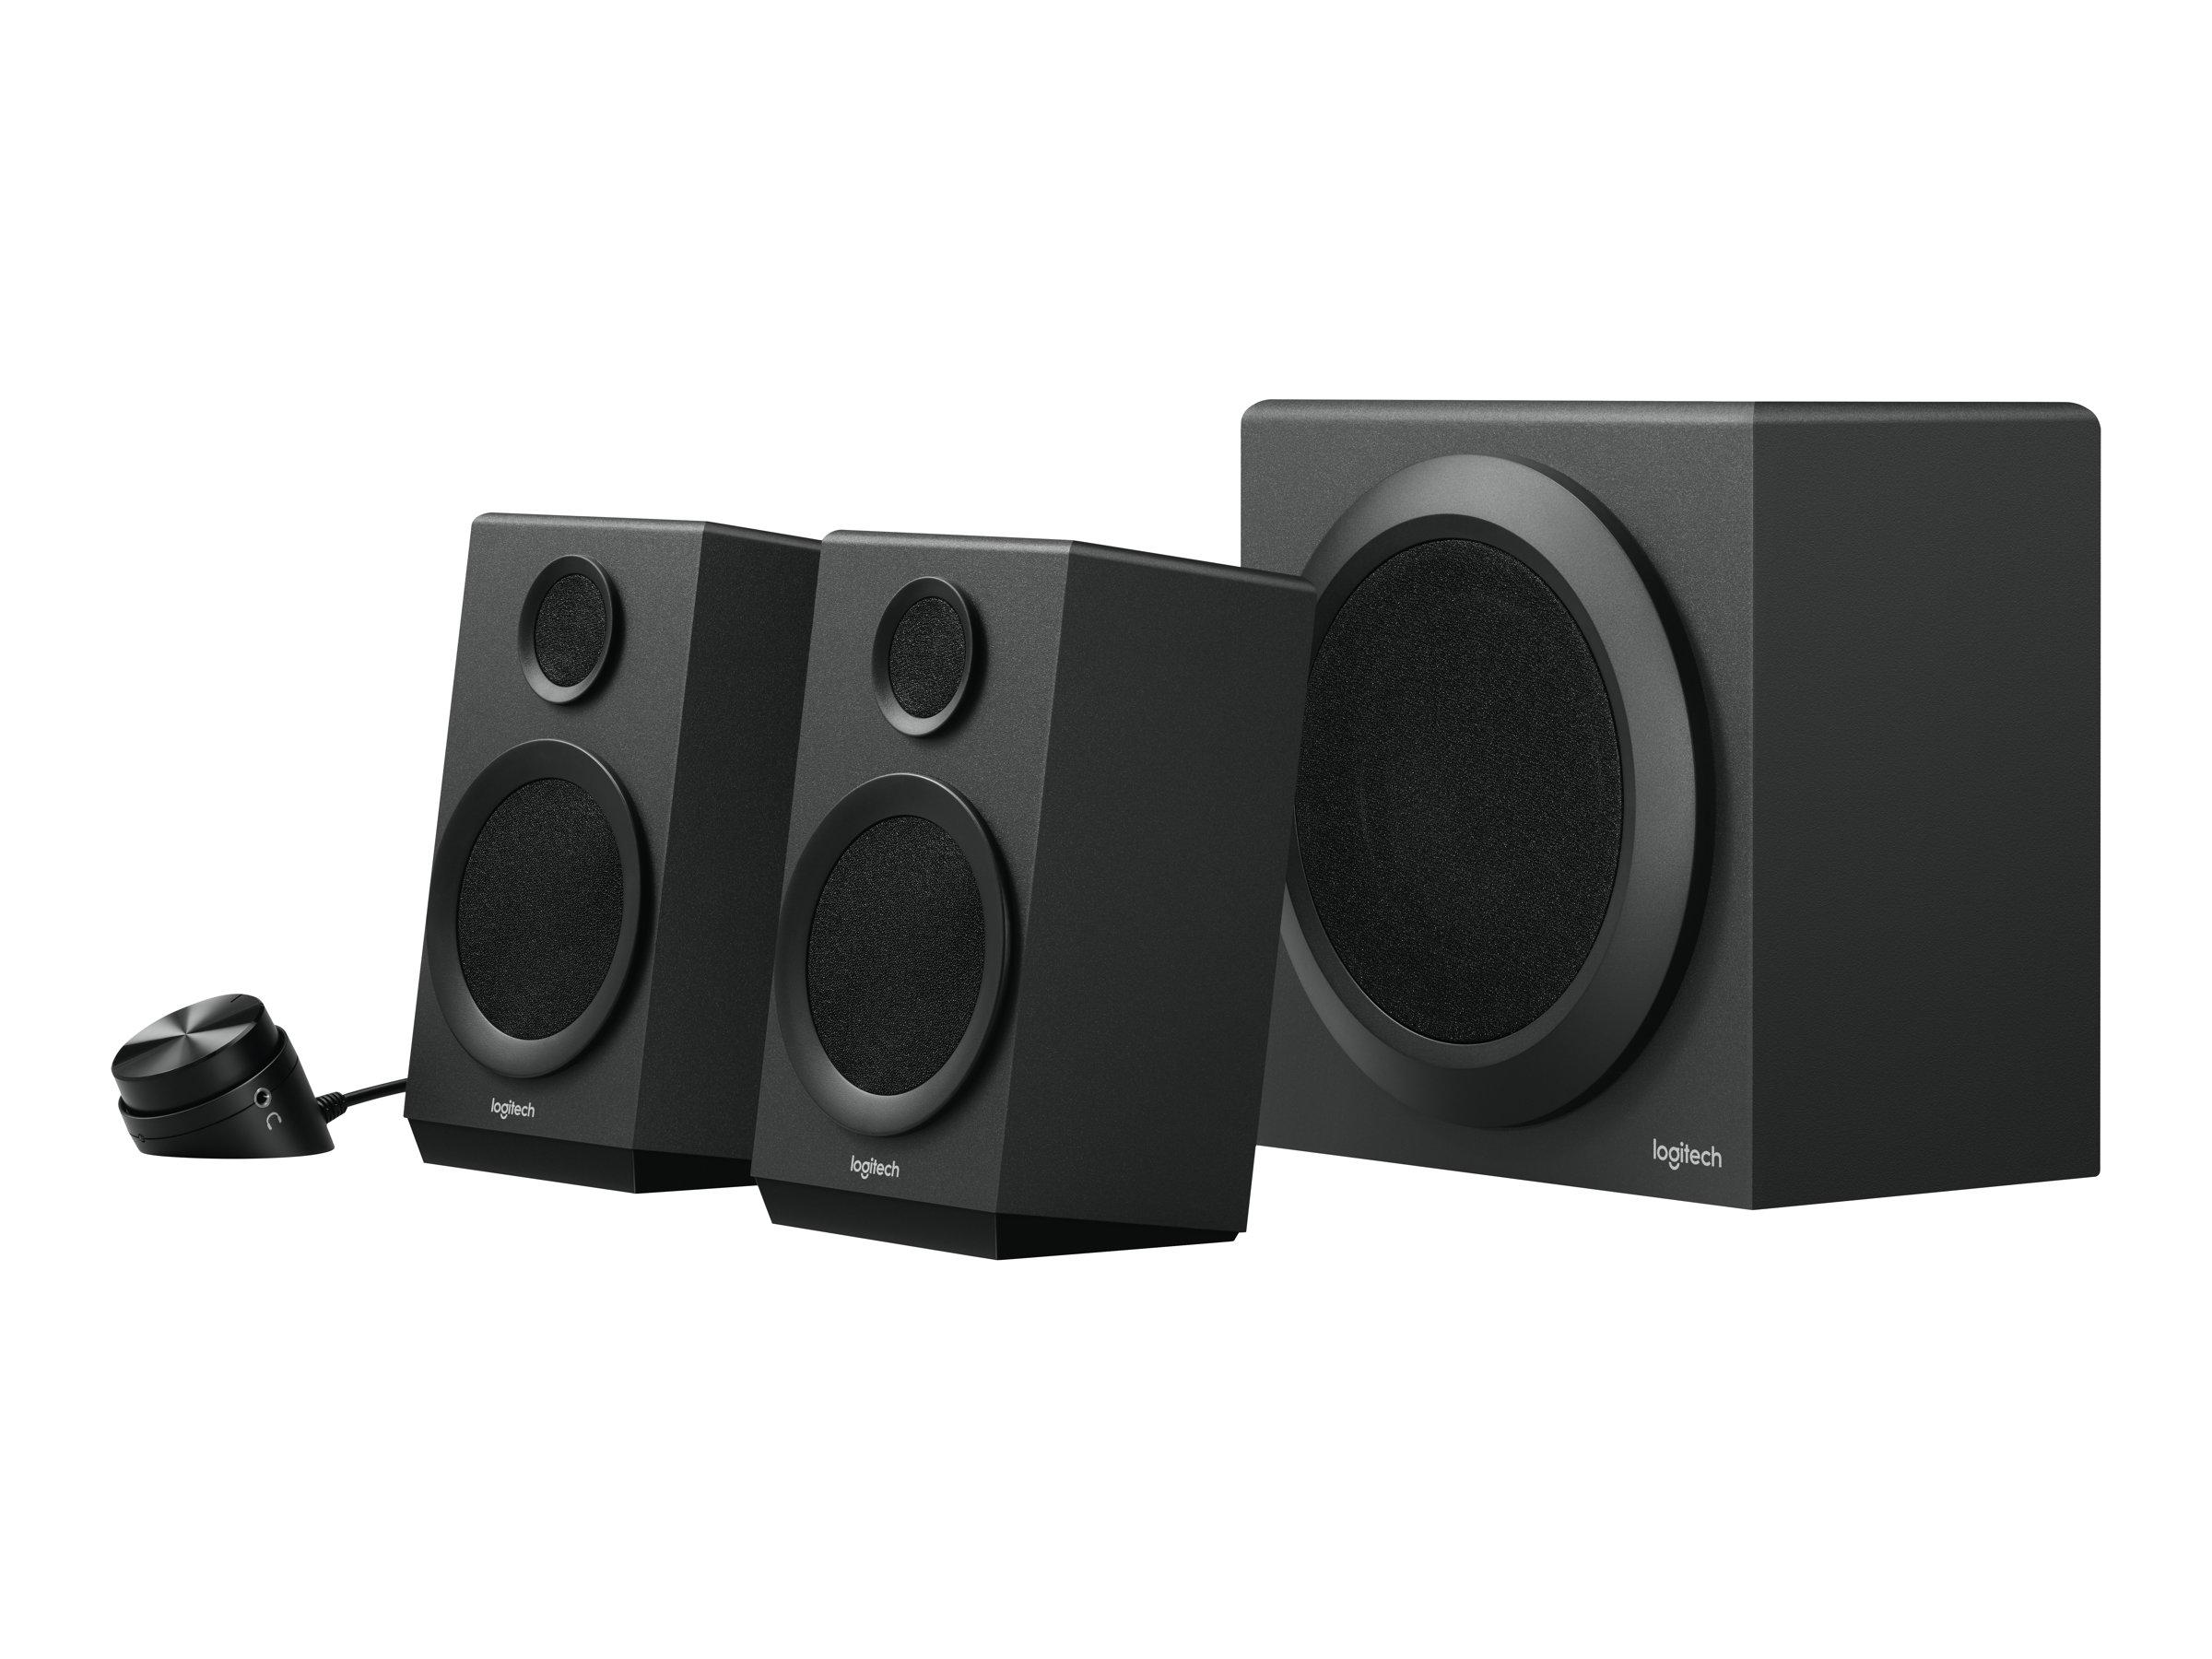 Logitech Z333 - Lautsprechersystem - für PC - 2.1-Kanal - 40 Watt (Gesamt)